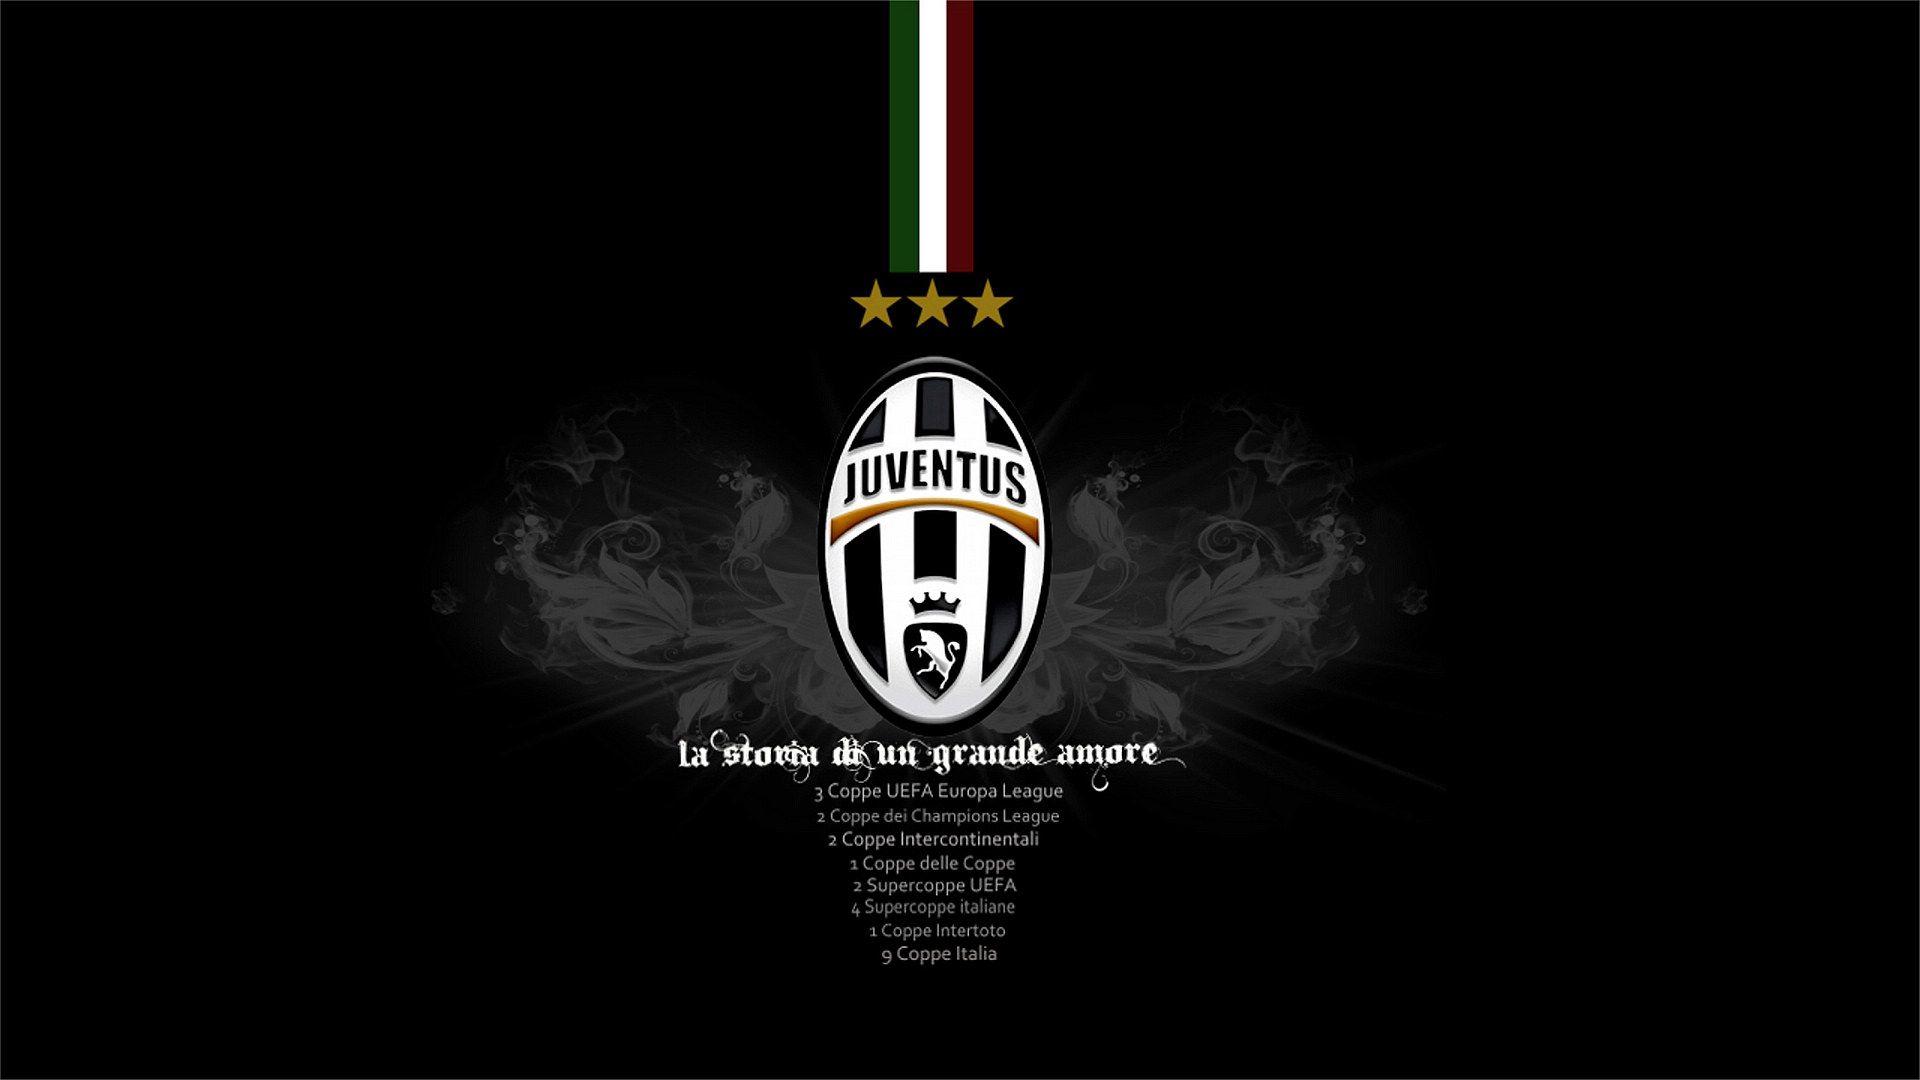 Juventus Wallpaper For Computer